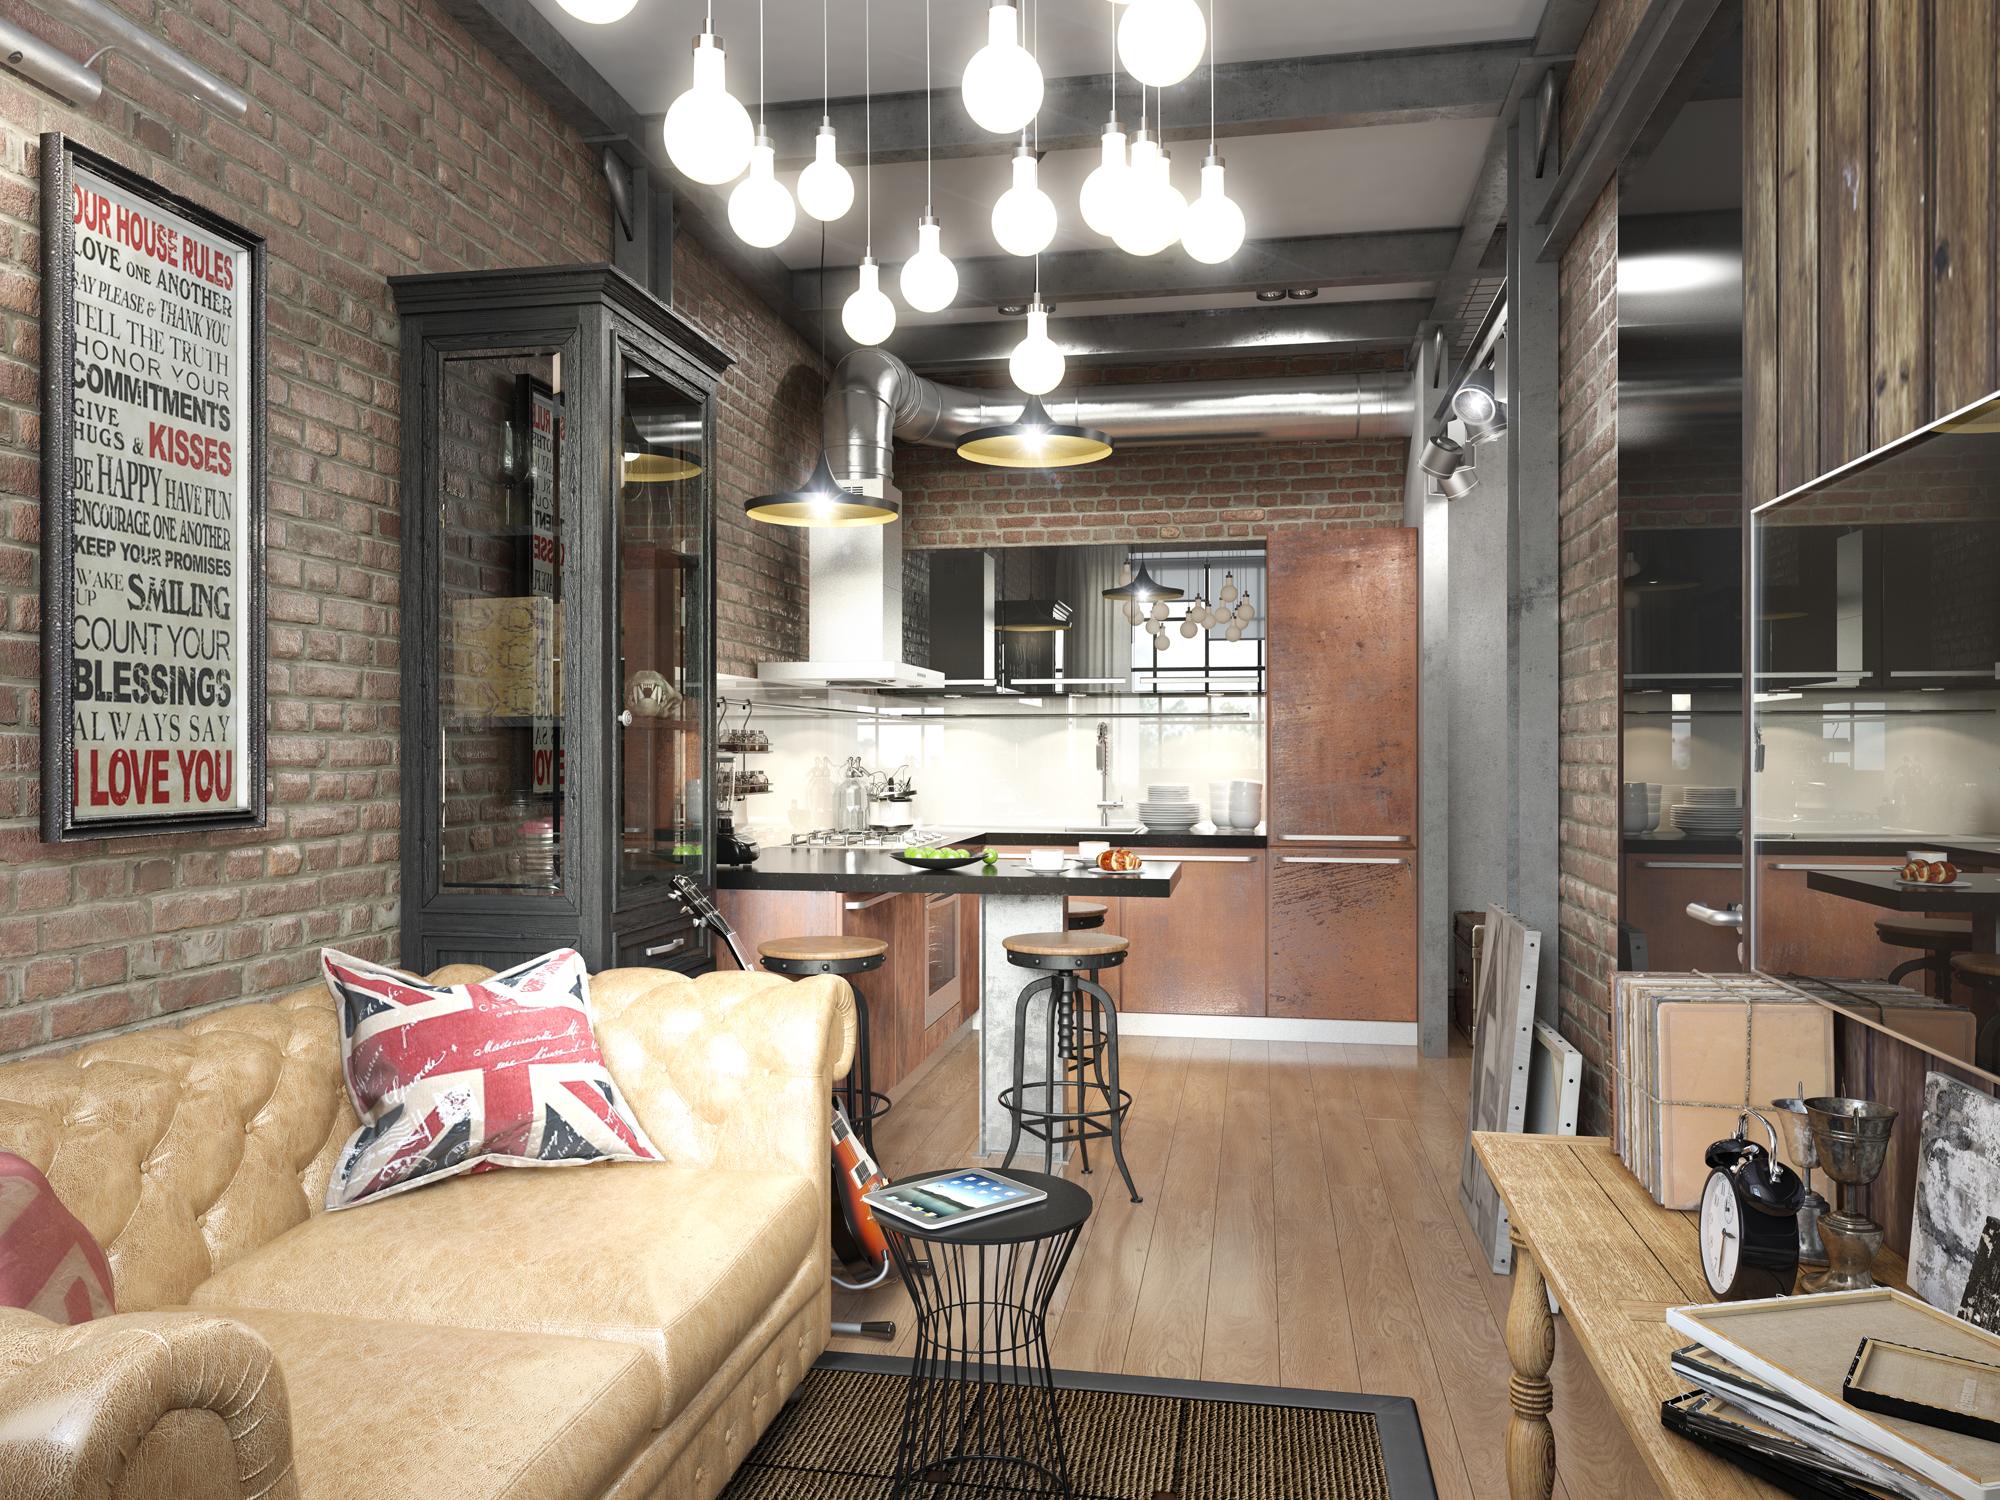 Studio_loft_livingroom-kitchen_cam_01